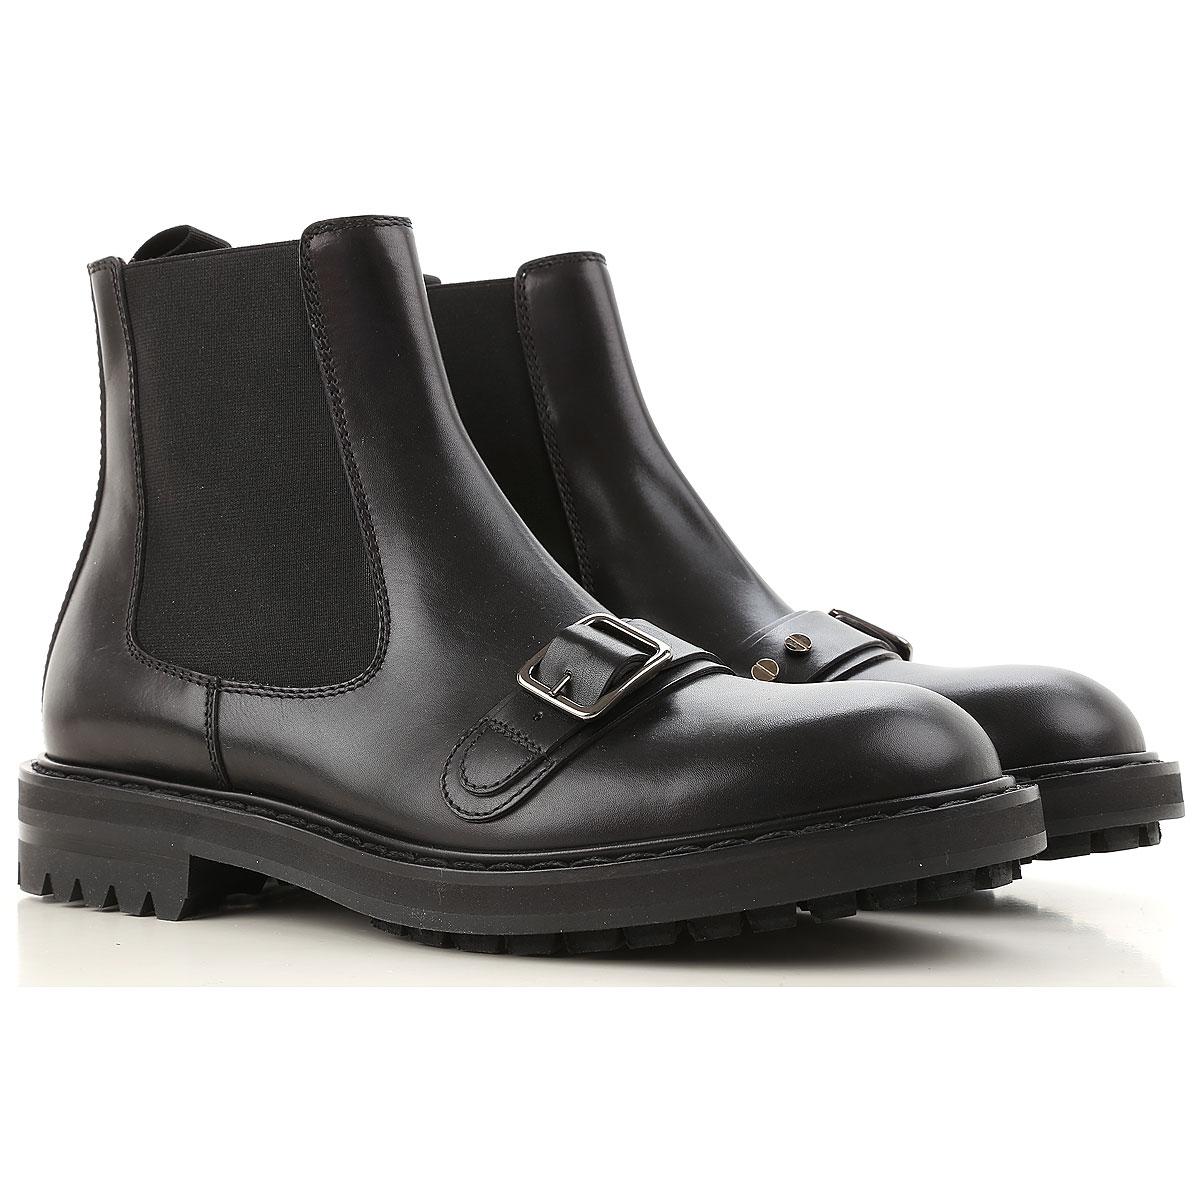 Image of Alexander McQueen Boots for Men, Booties On Sale, Black, Calfskin Leather, 2017, EUR 42.5 - US 9.5 - UK 8.5 EUR 42 - US 9 - UK 8 EUR 43 - US 10 - UK 9